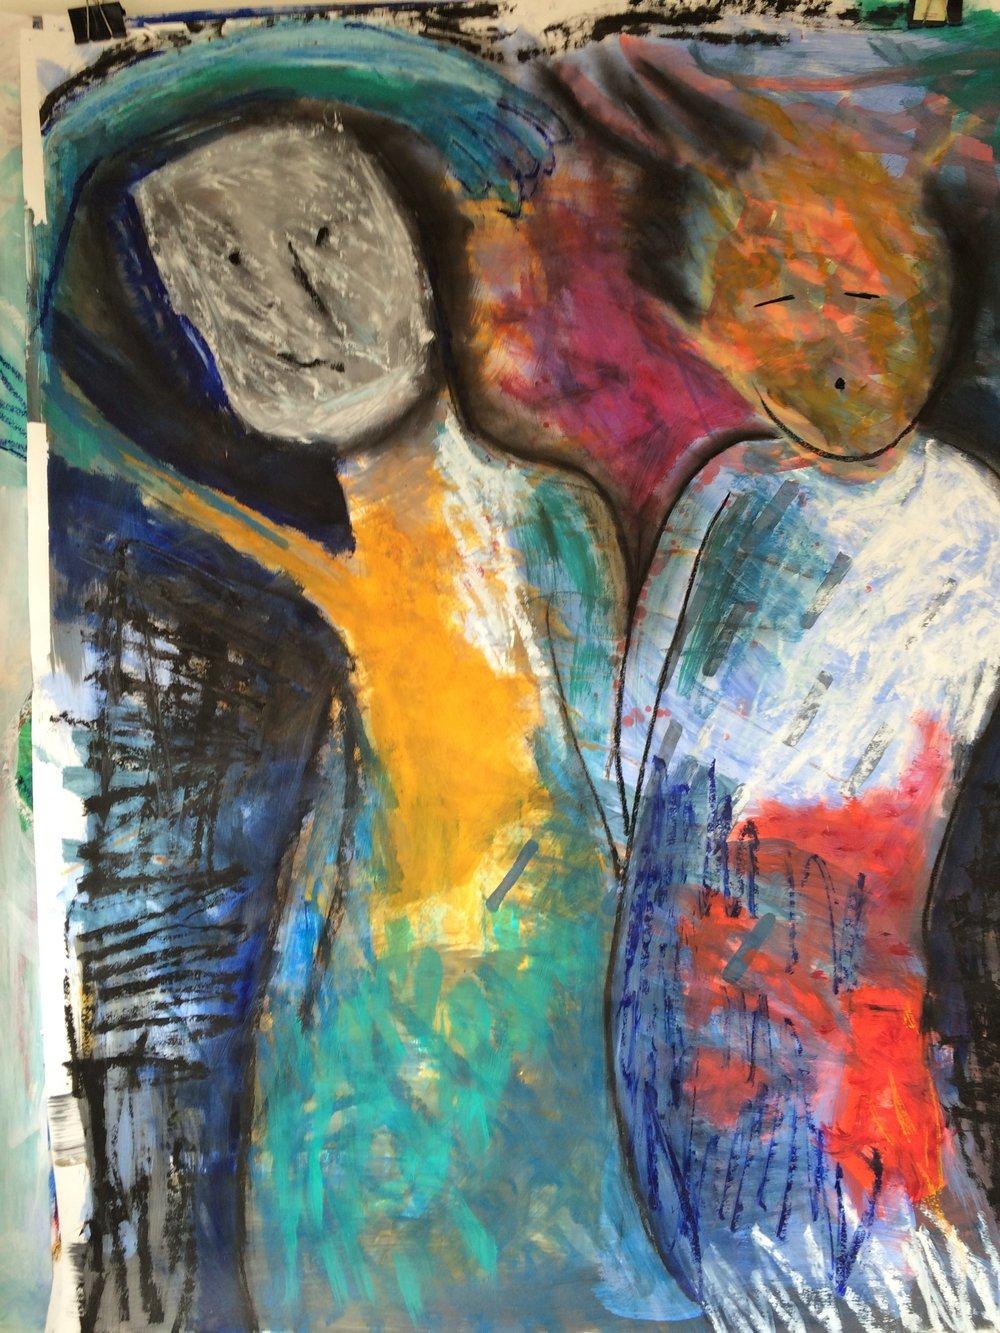 Ancestors 1 , 2016 acrylic and oilstick on paper 100x68cm